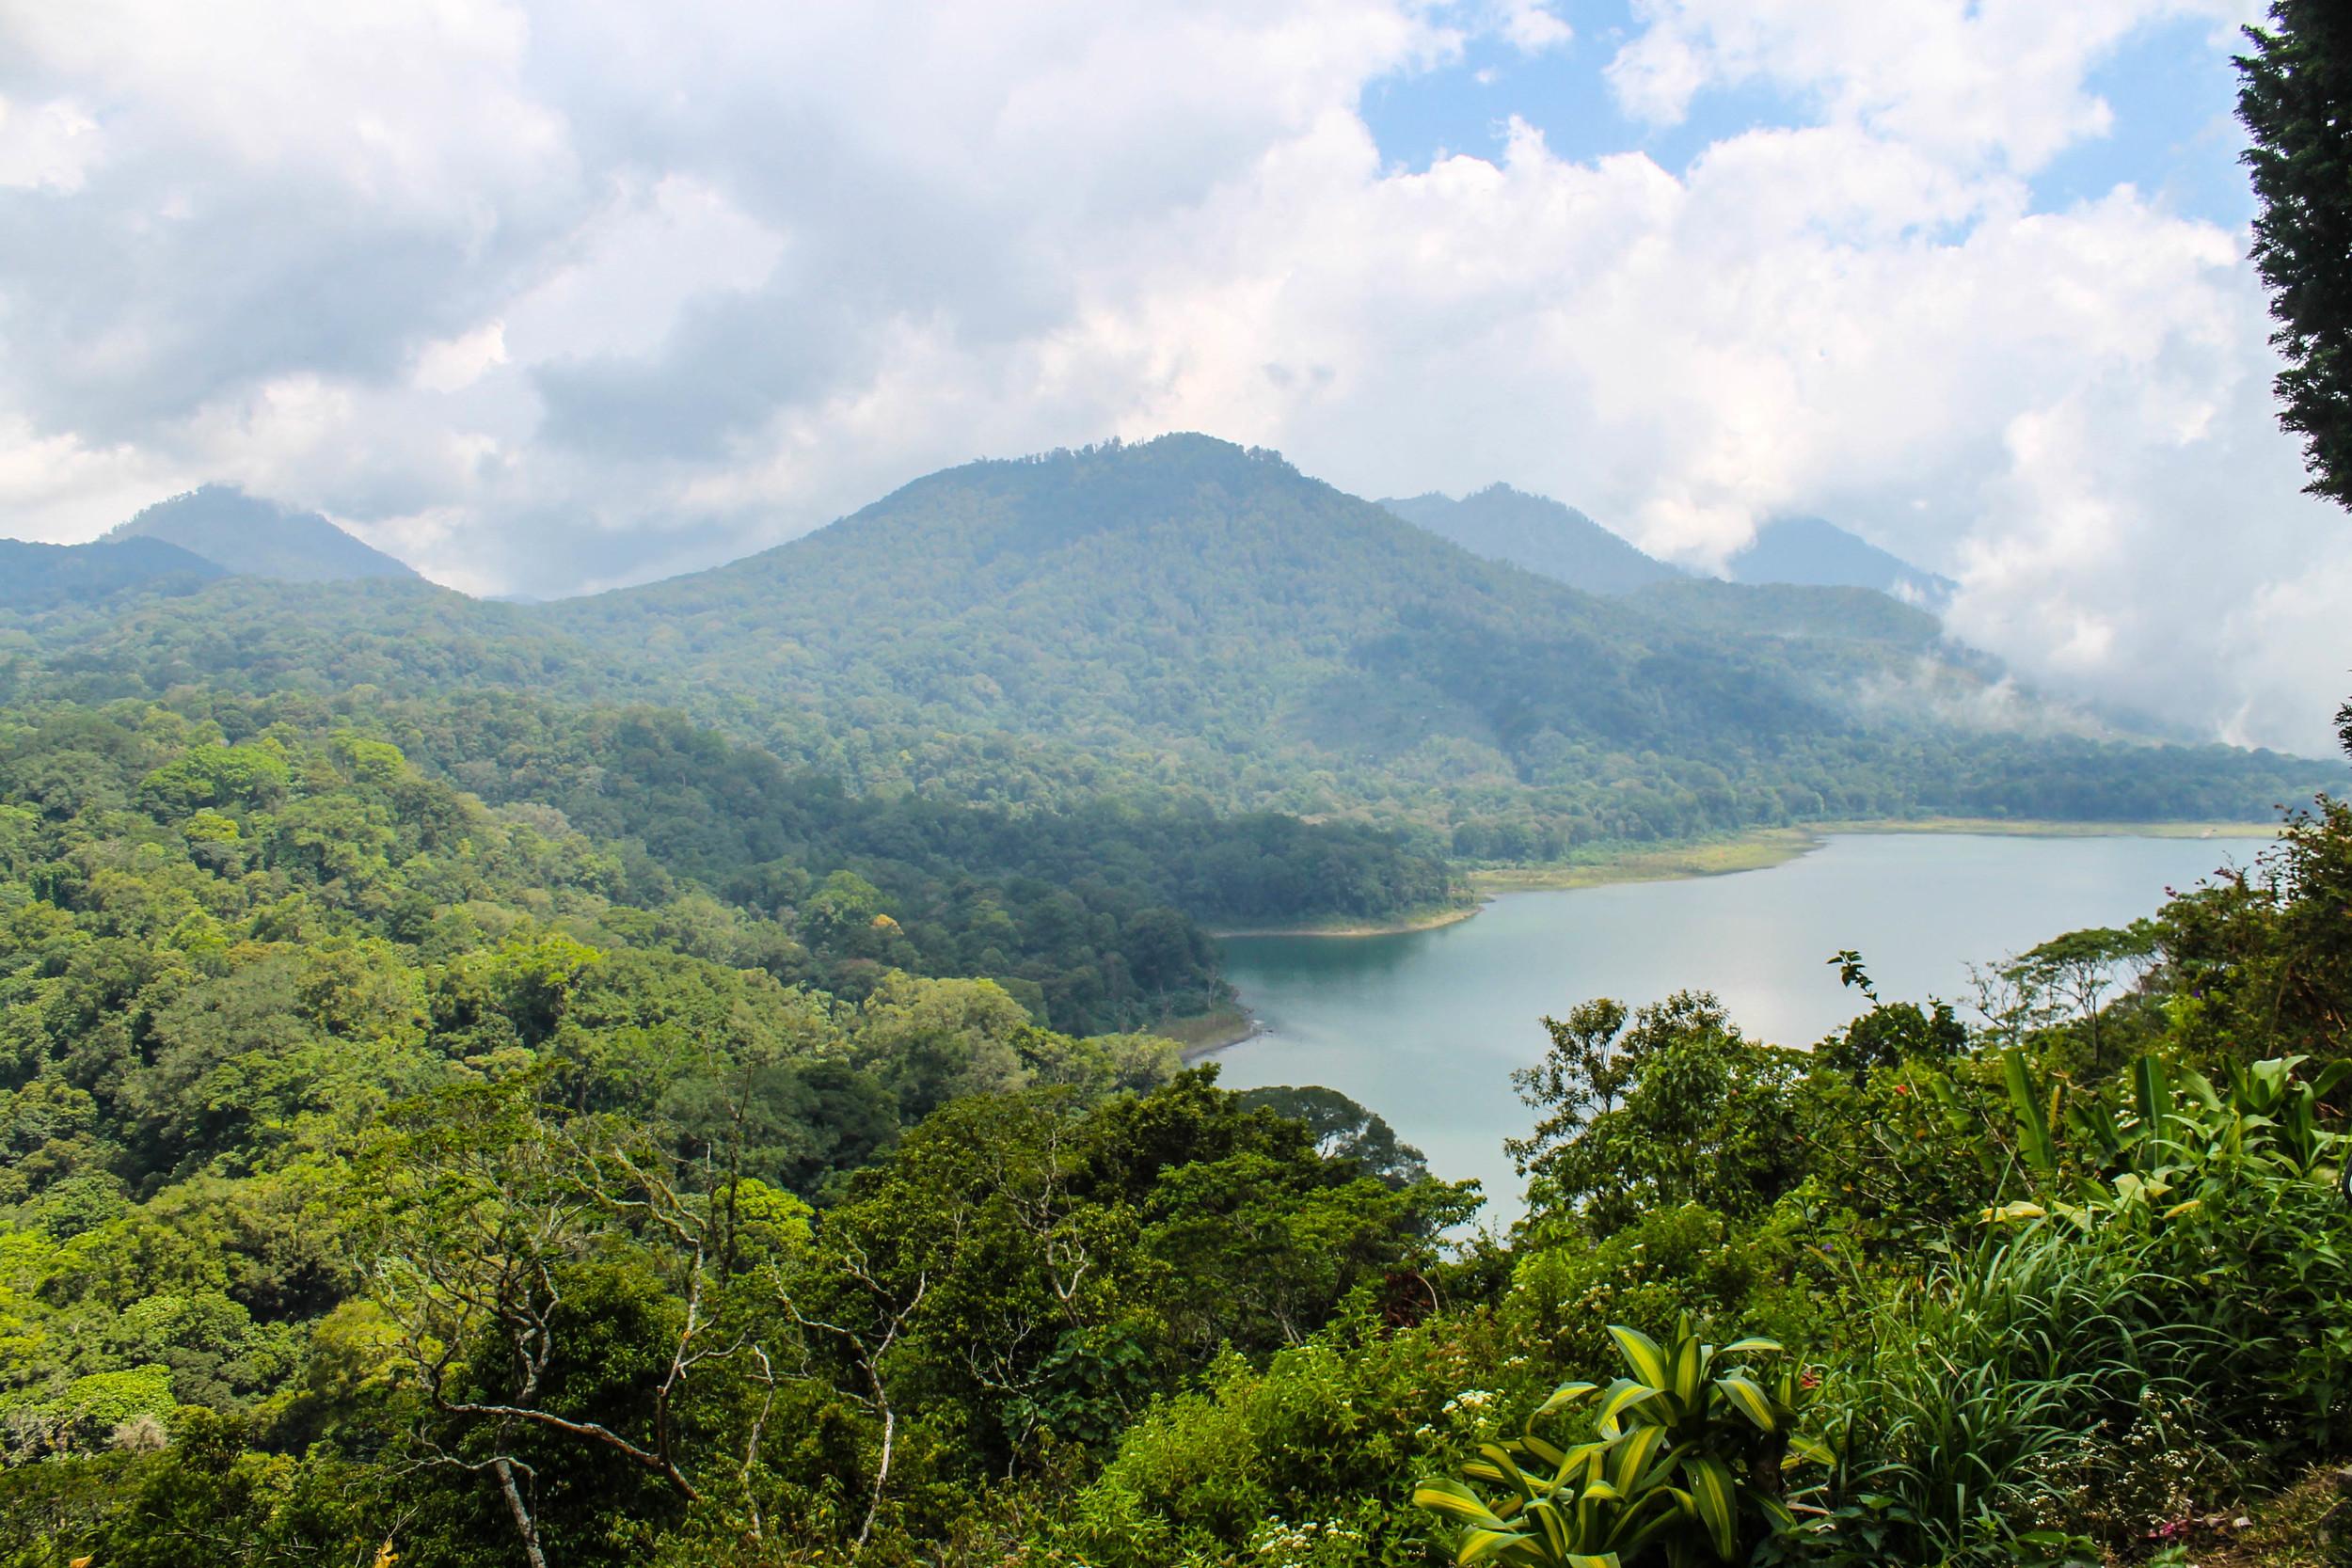 bali-mountains-north